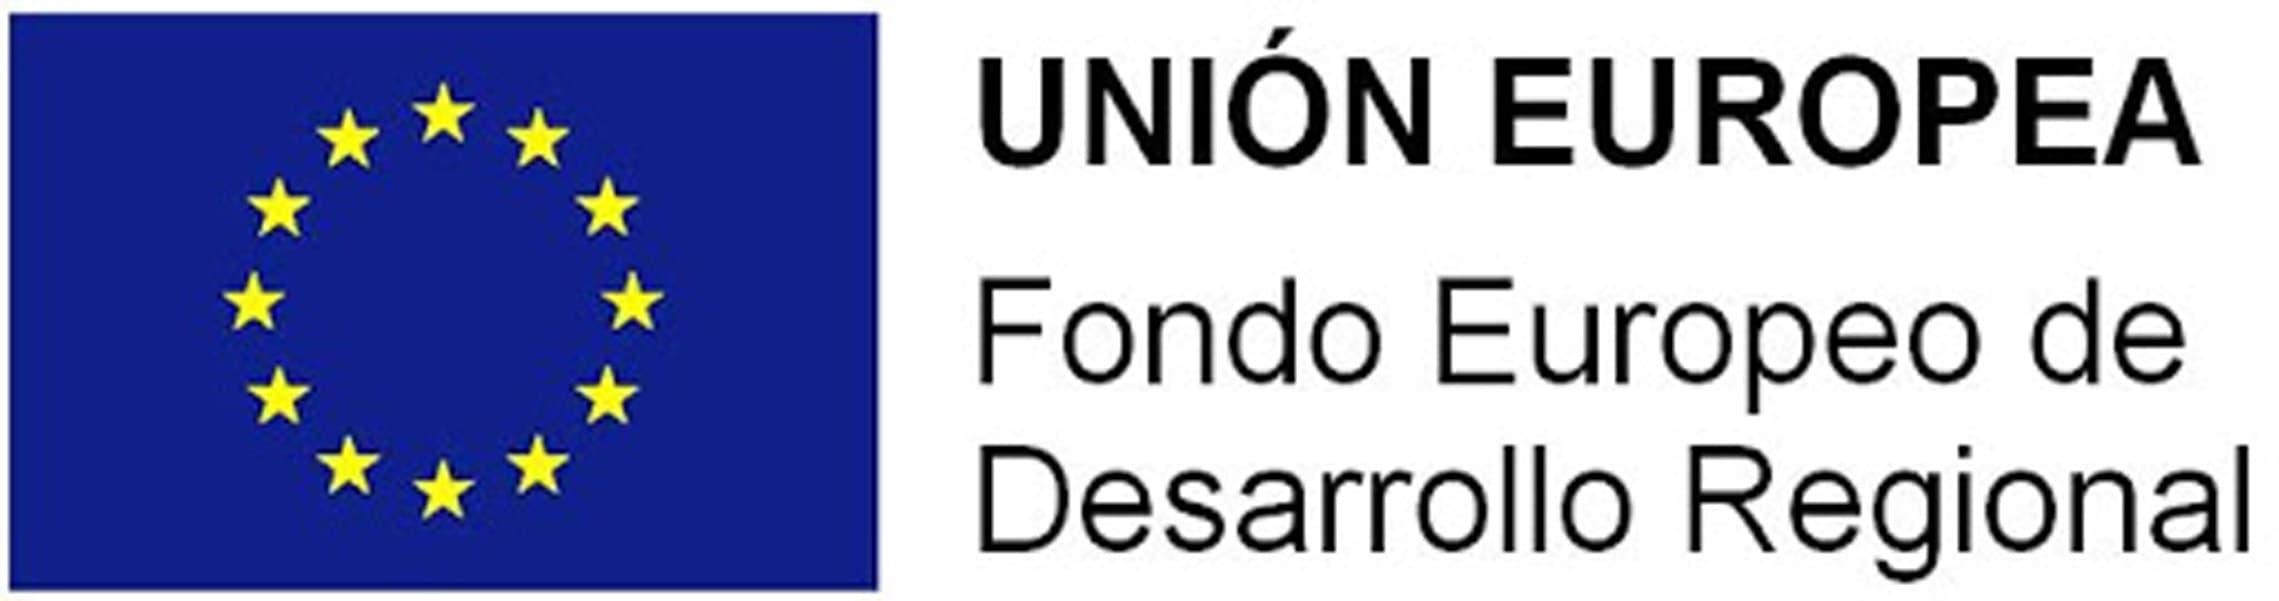 UE Fondo Europeo de Desarrollo Regional